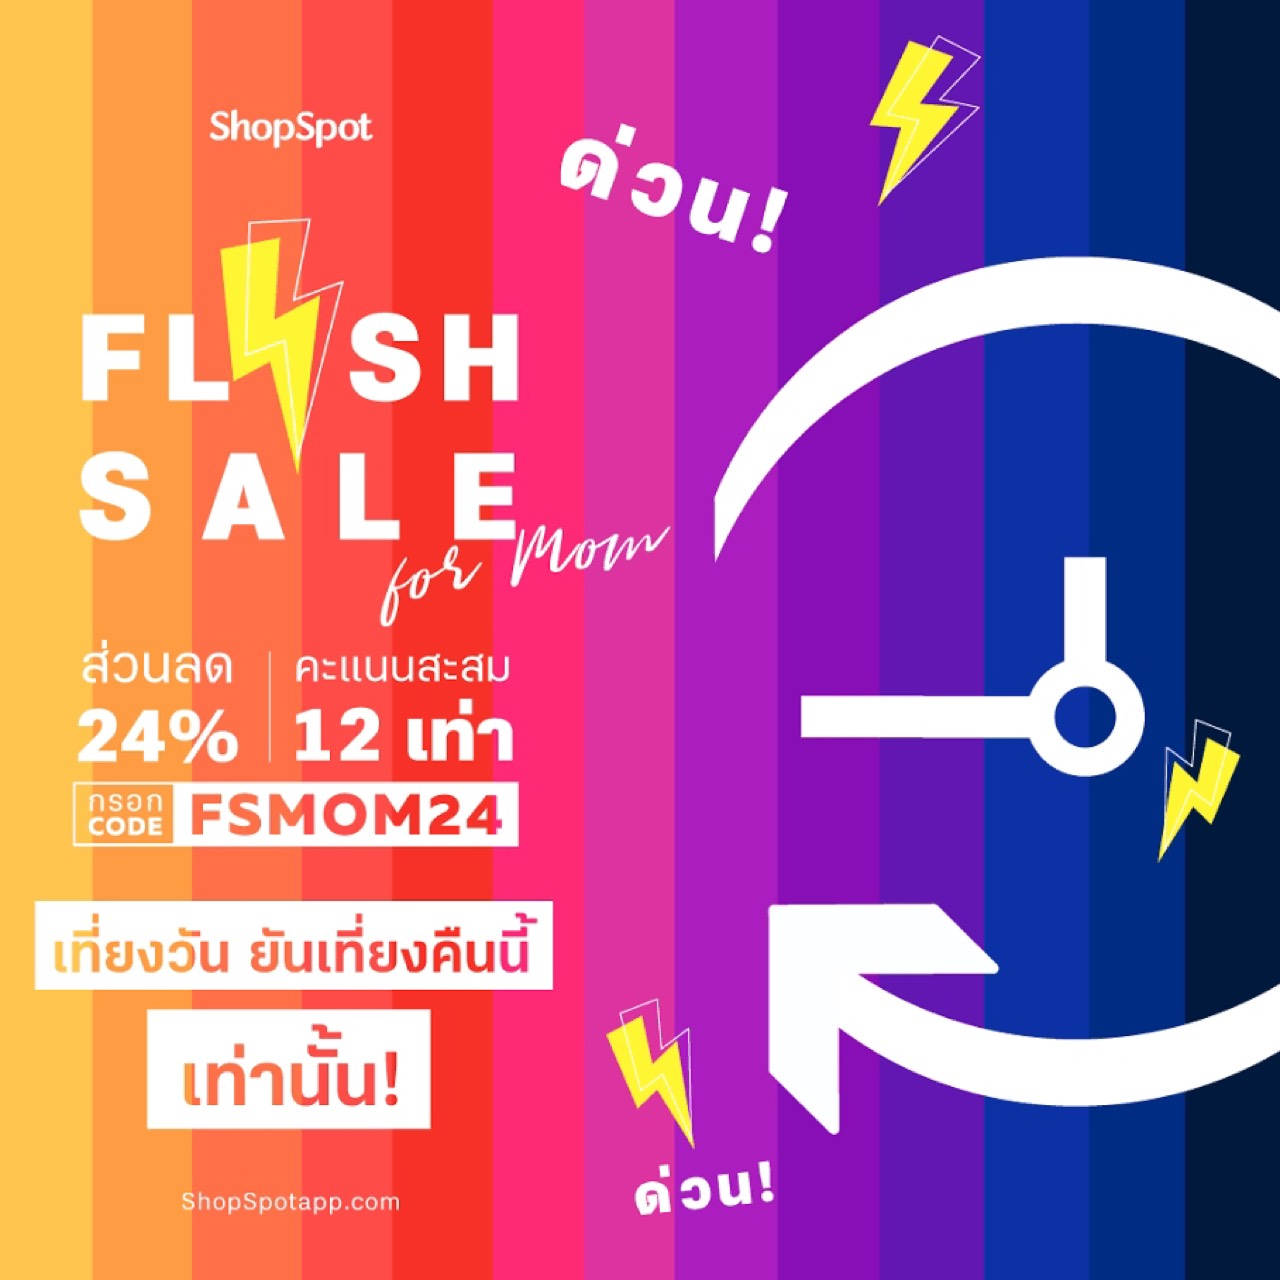 flashsaleformom,ช้อปเพื่อแม่,shopspot,ShopSpotOfficial